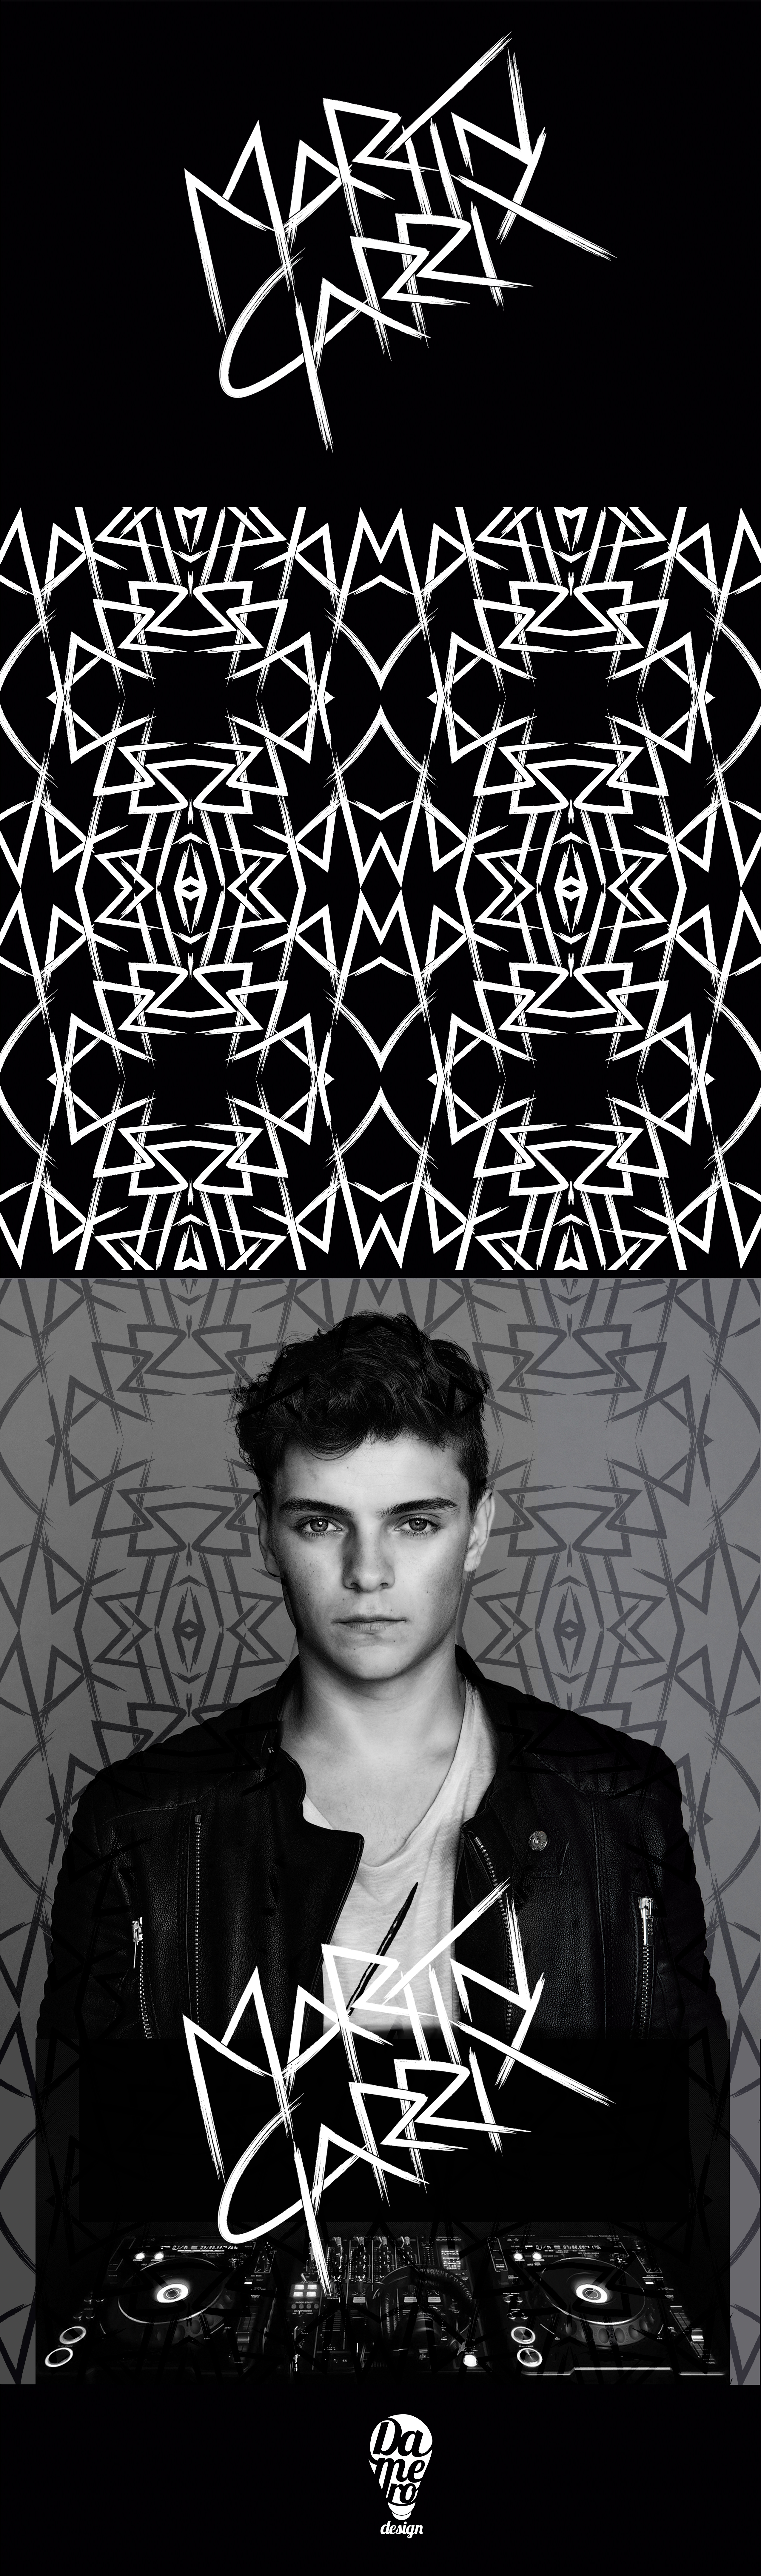 New Martin Garrix S Logo And Pattern Application By Damerodesign Martin Garrix Martin Martin Garrix Show